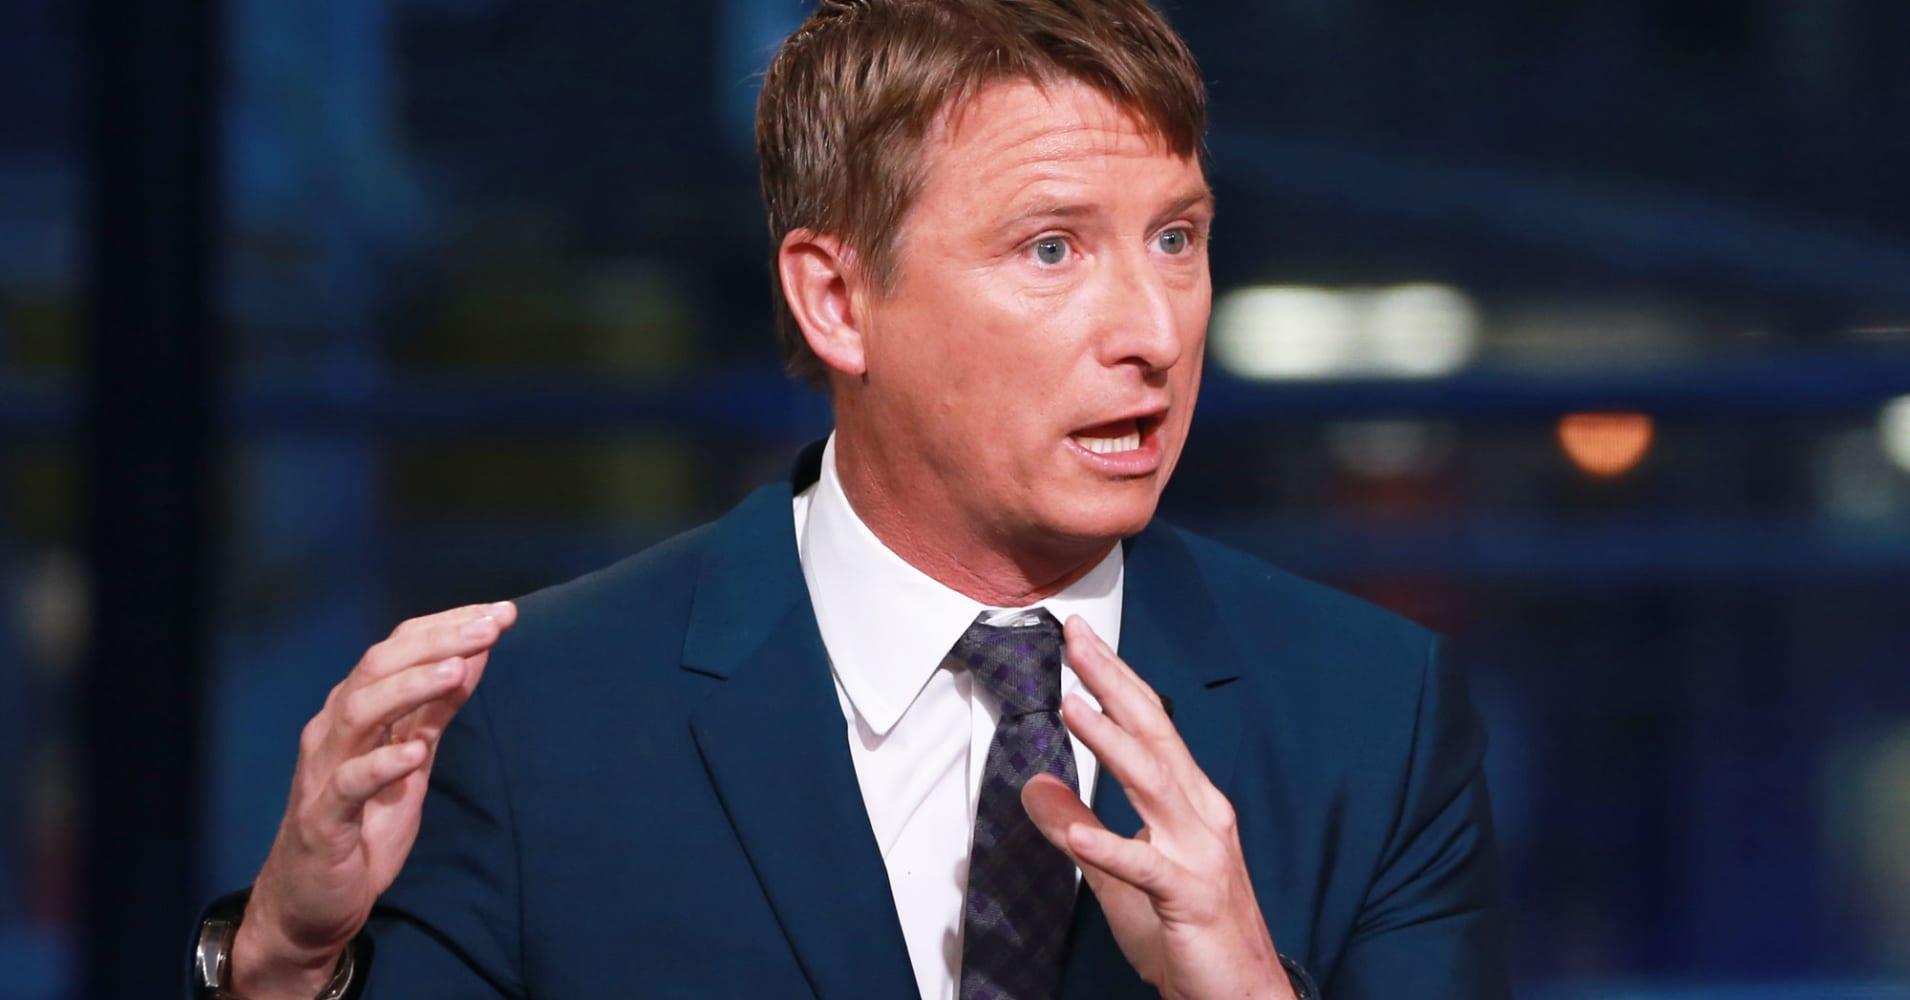 Athenahealth founder and former CEO Jonathan Bush blasts activist investor, Elliott